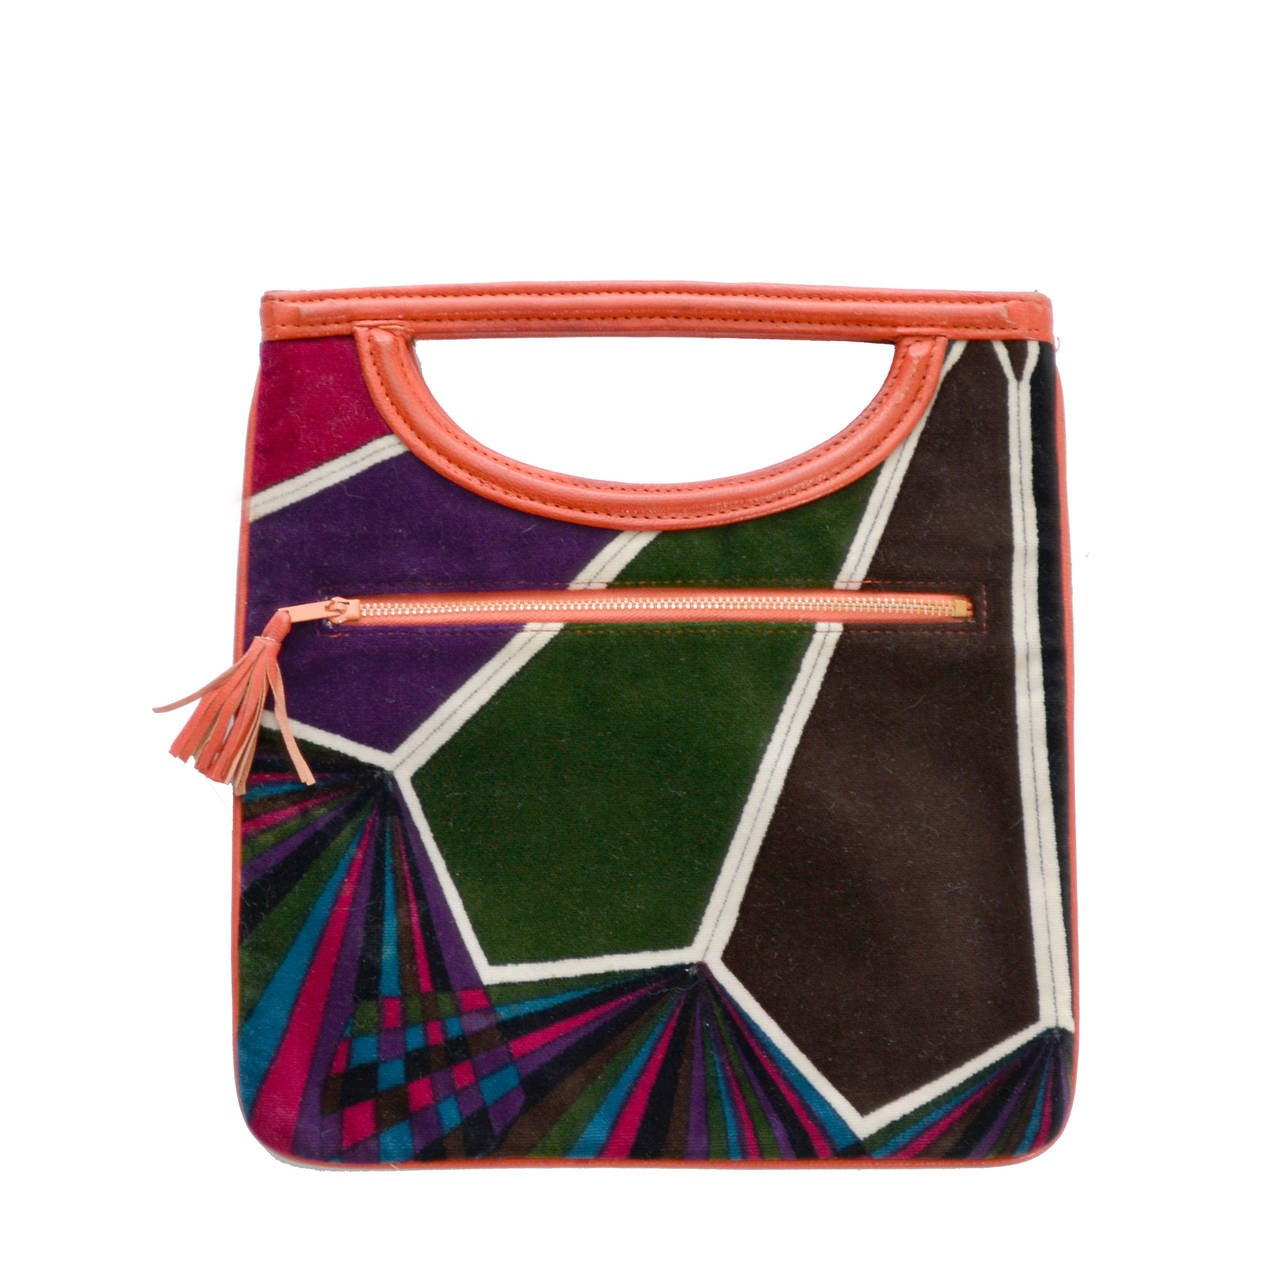 1960s Rare Emilio Pucci Jana Vintage Velvet Handbag Mod Geometric OpArt Rare Bag For Sale